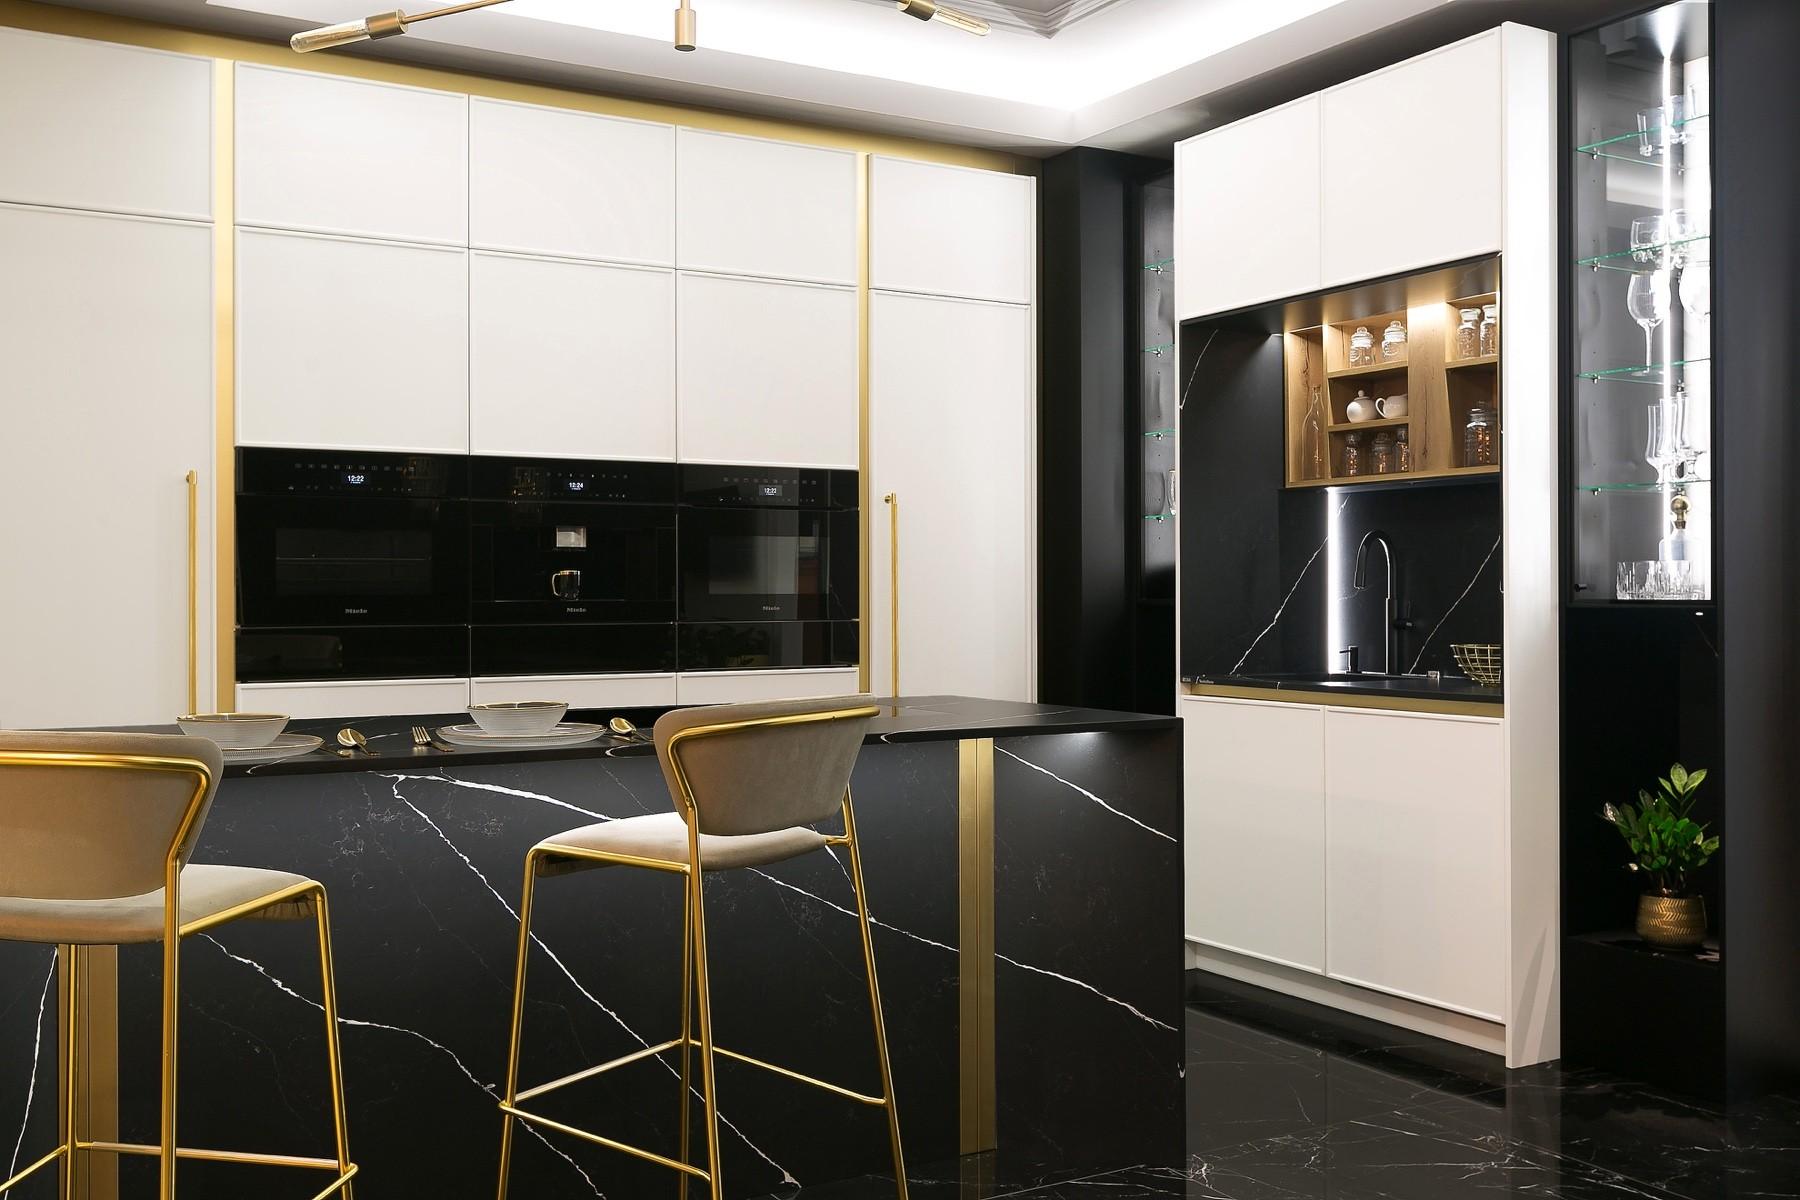 moderni kuchyne livorno